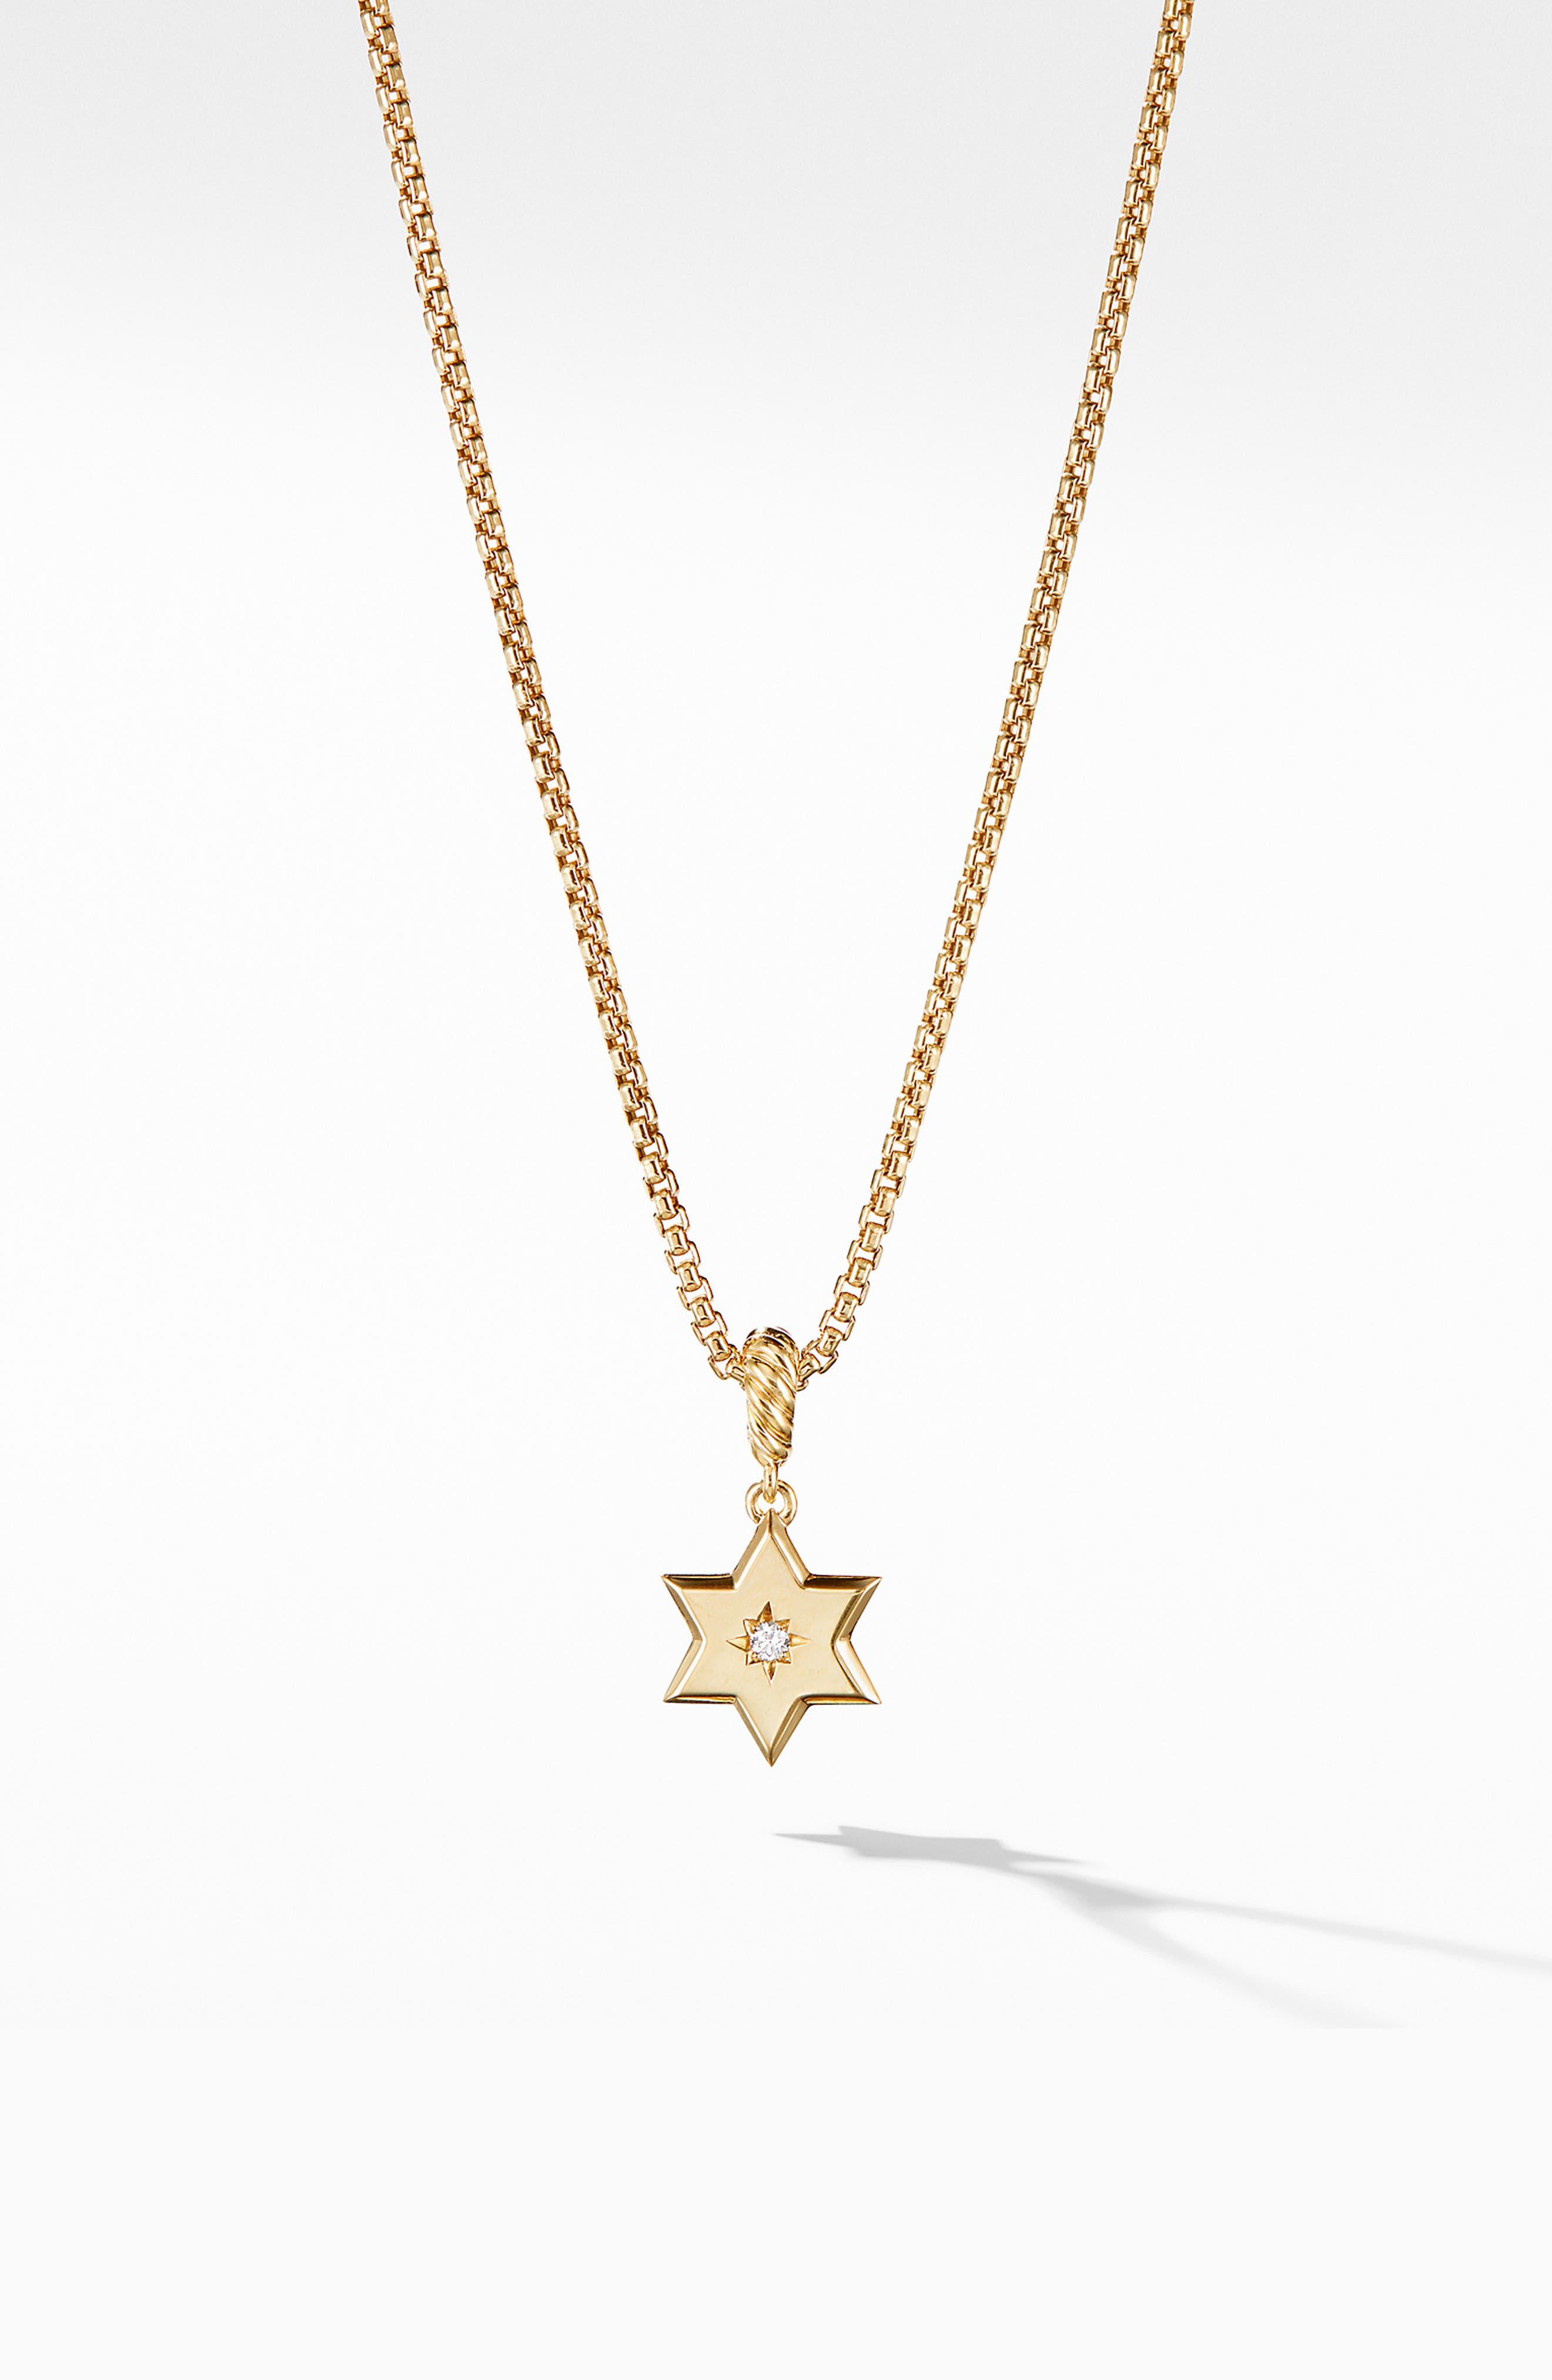 Star of David Pendant in 18K Yellow Gold with Diamonds,                             Main thumbnail 1, color,                             YELLOW GOLD/ DIAMOND